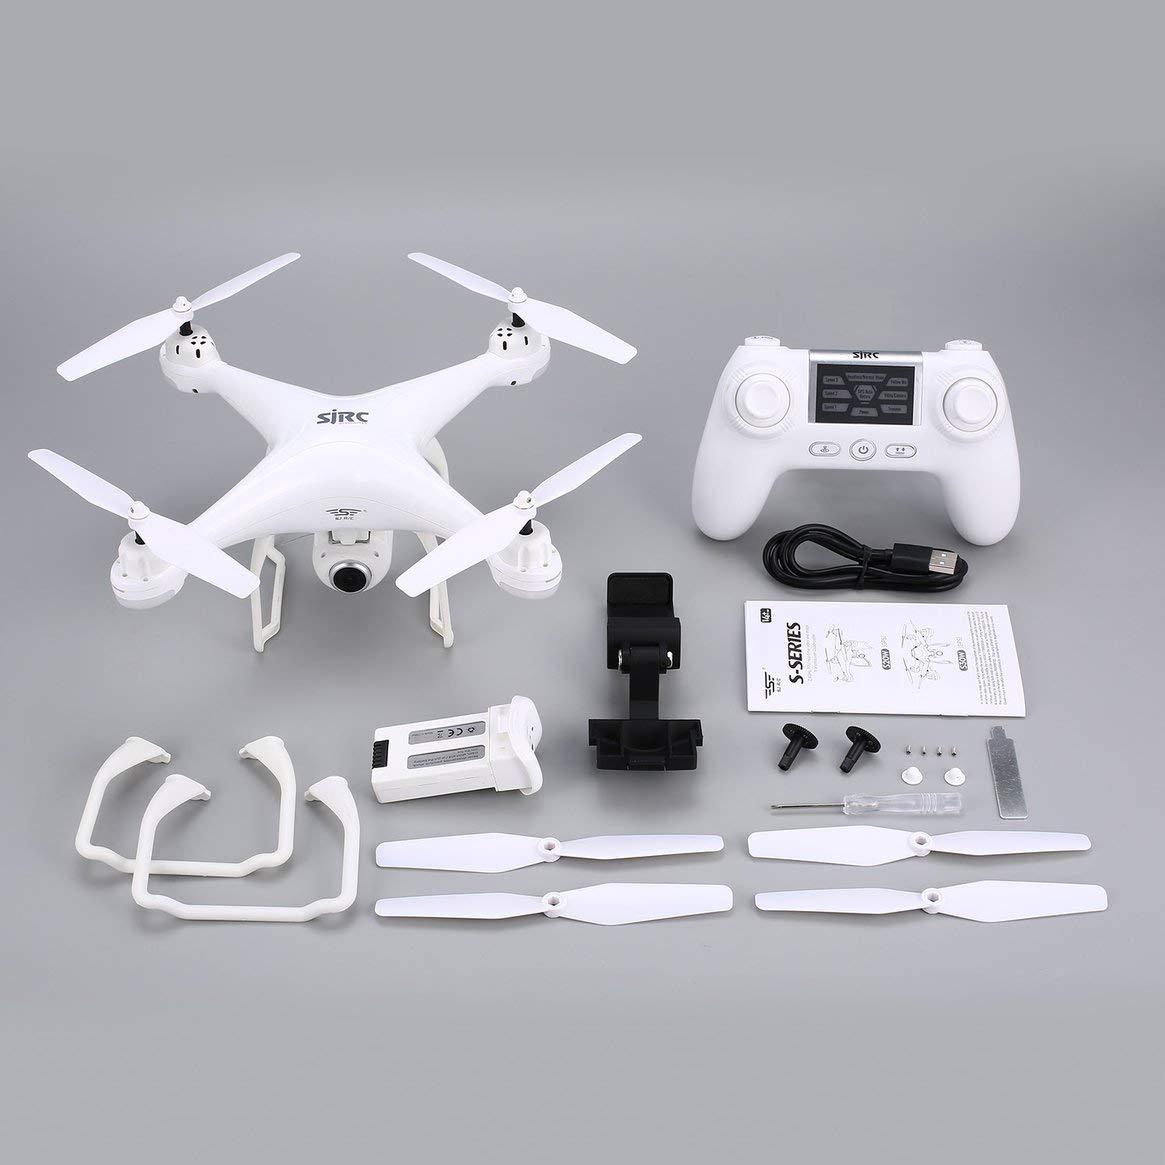 Delicacydex SJ R / C S20W FPV 1080 P Kamera Selfie Höhe Halten Drohne Headless Modus Auto Return Start / Landung Hover GPS RC Quadcopter